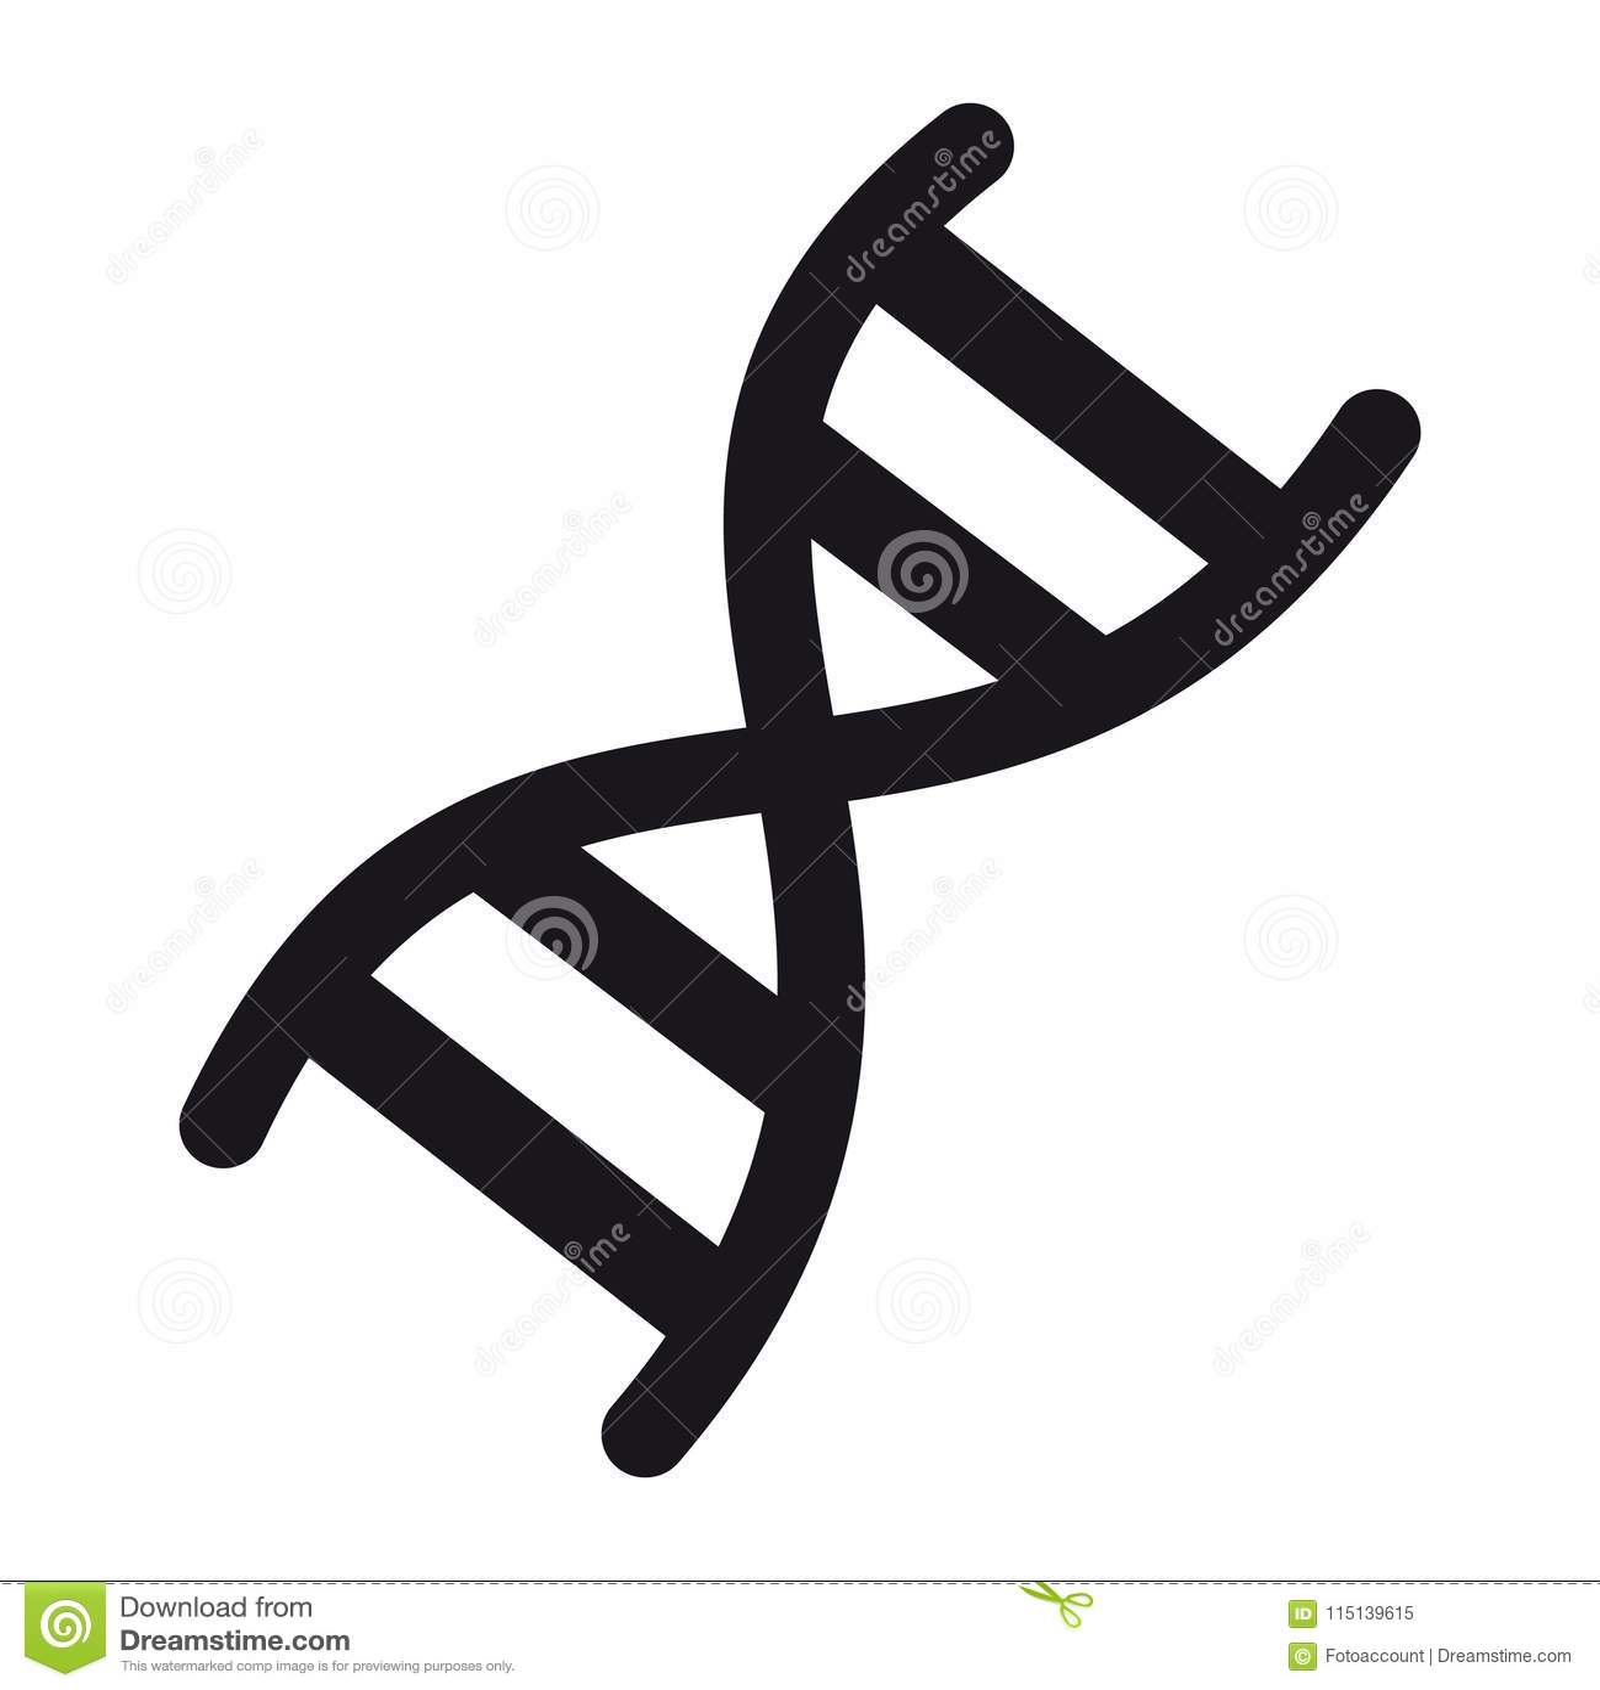 DNA-Chromosom-Ikone - Vektor-Illustration - lokalisiert auf Weiß